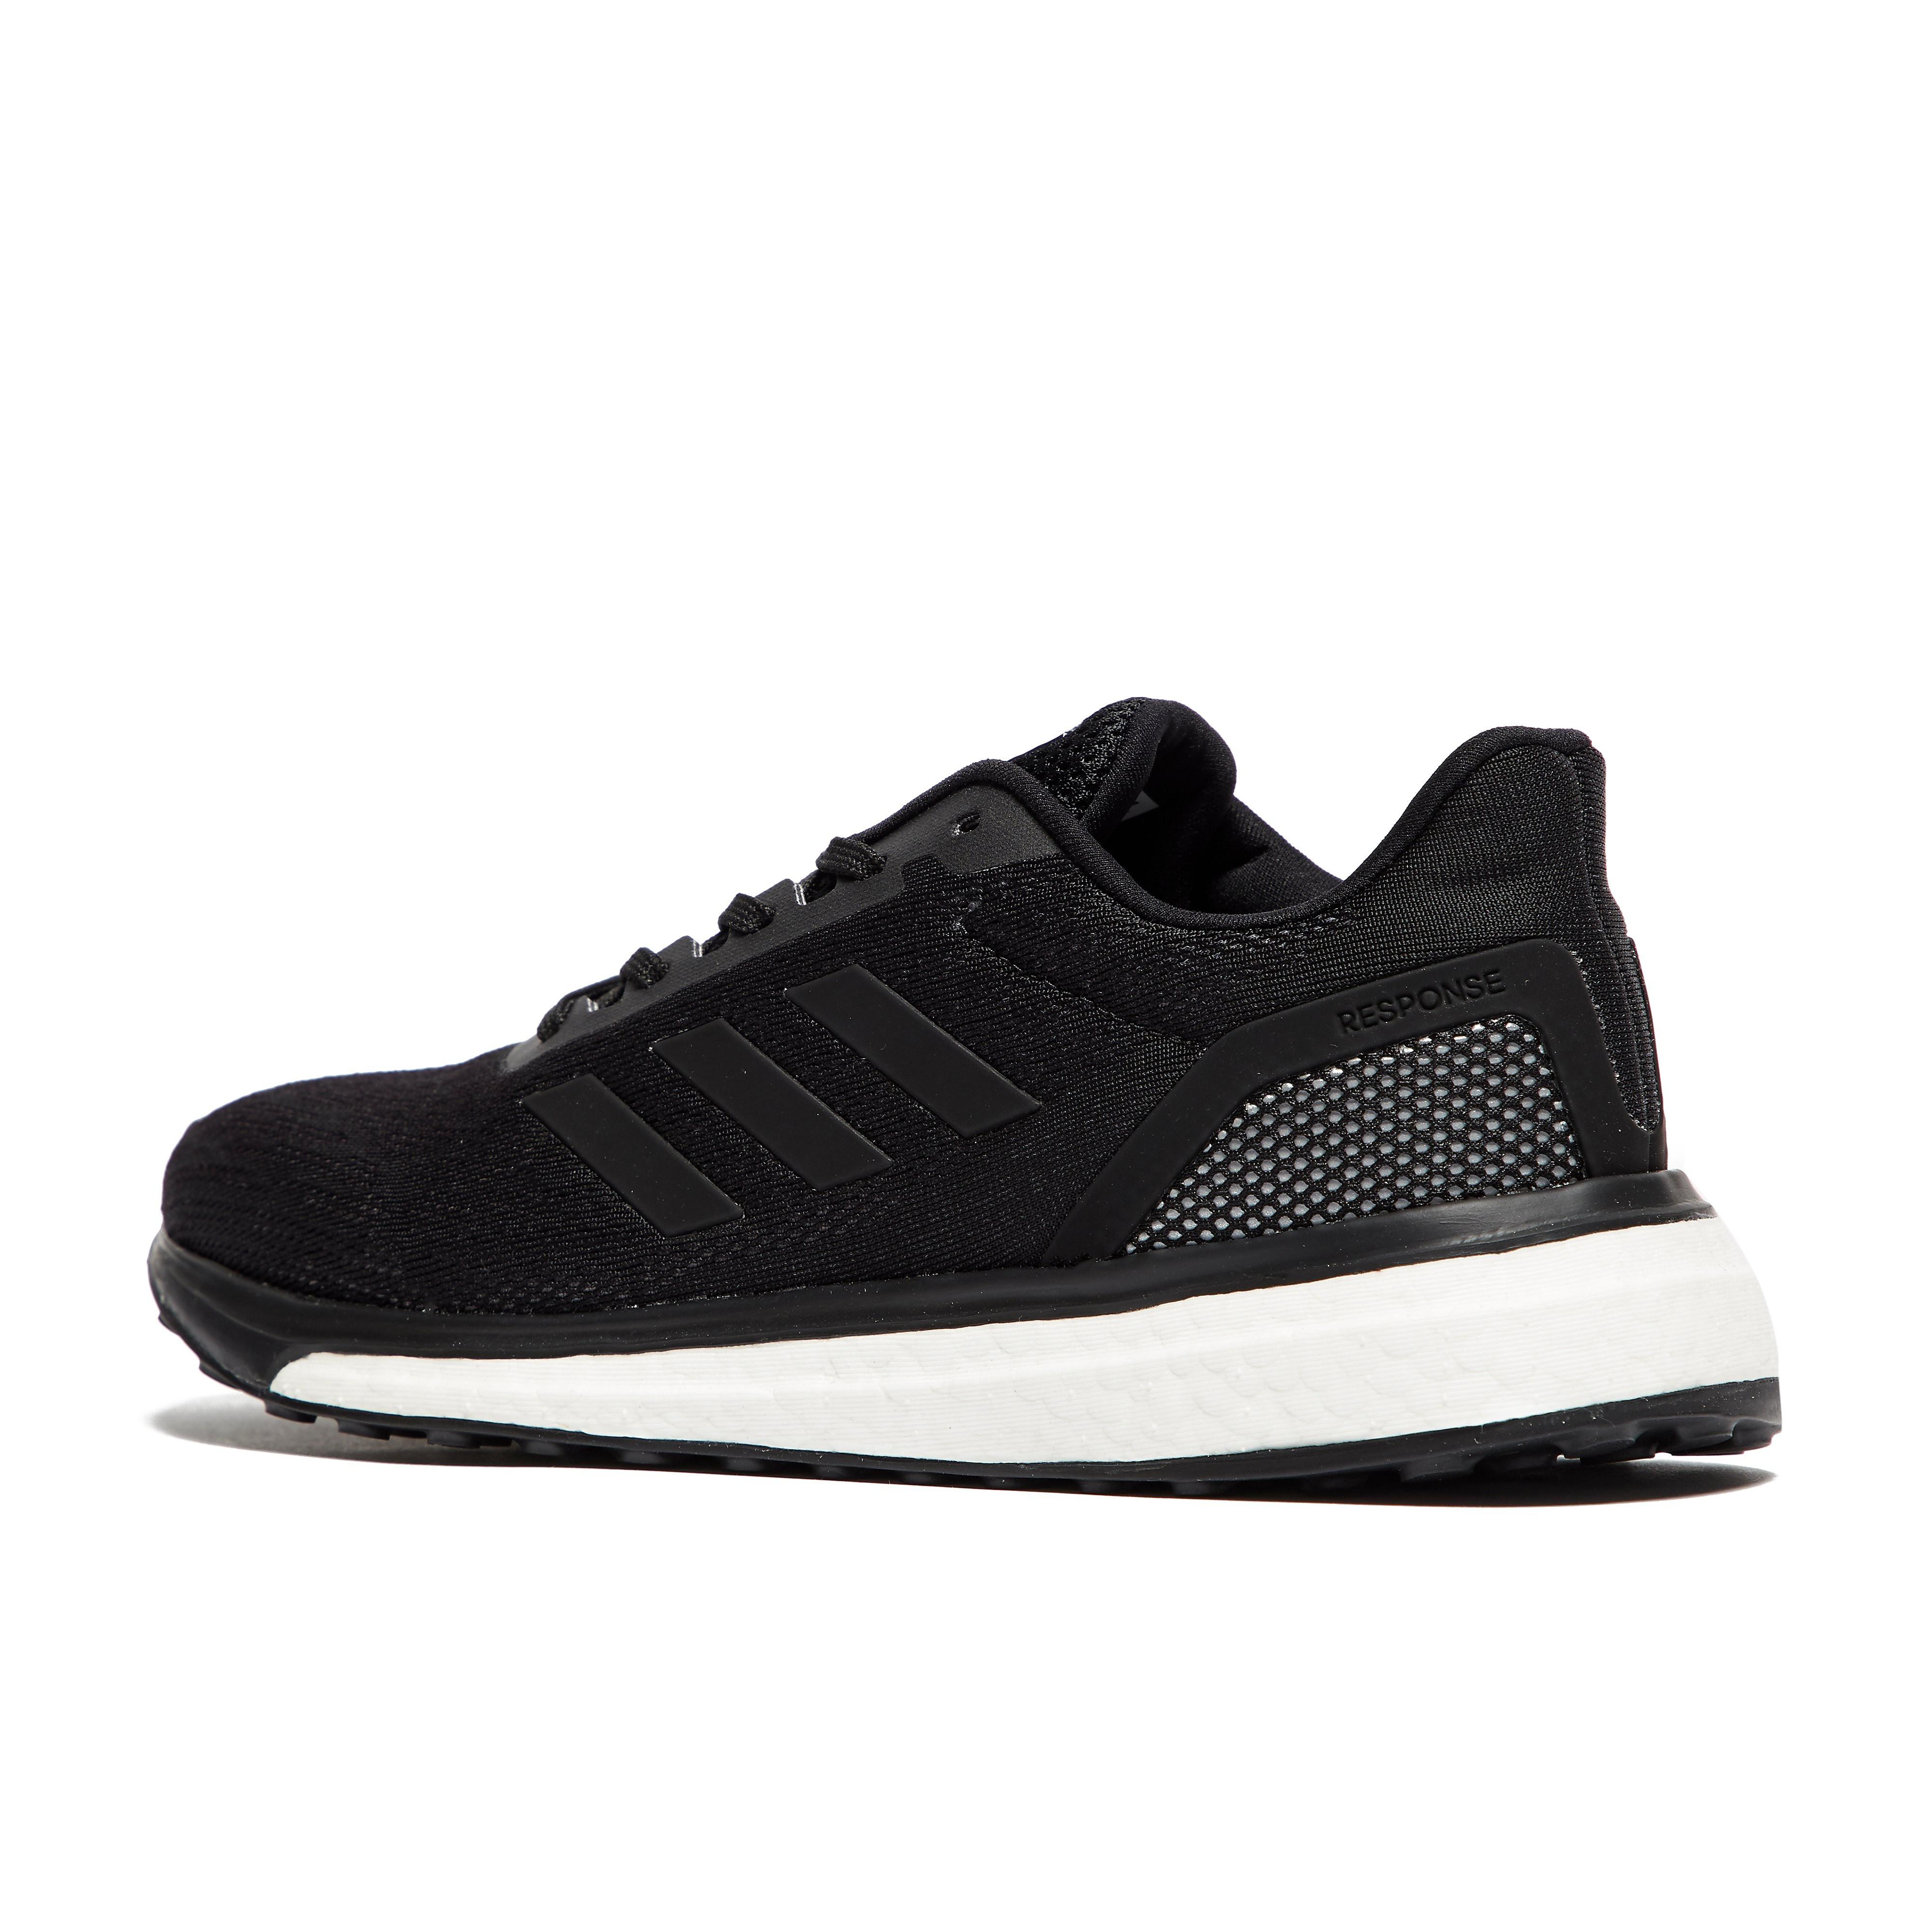 adidas Response Women's Running Shoes